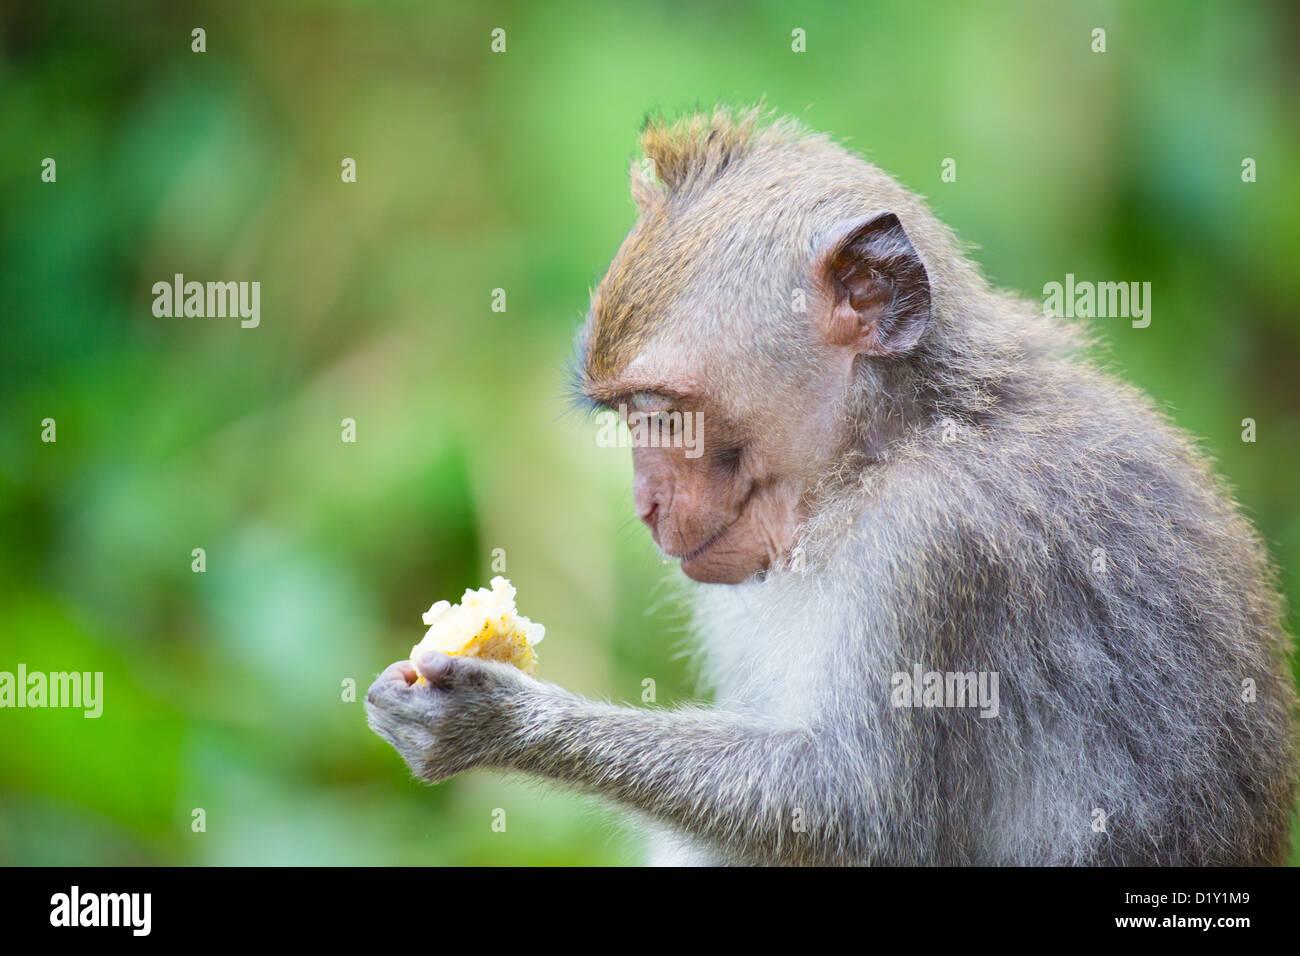 Rhesus macaque monkey in the Monkey Forest, Ubud,, Bali, Indonesia - Stock Image